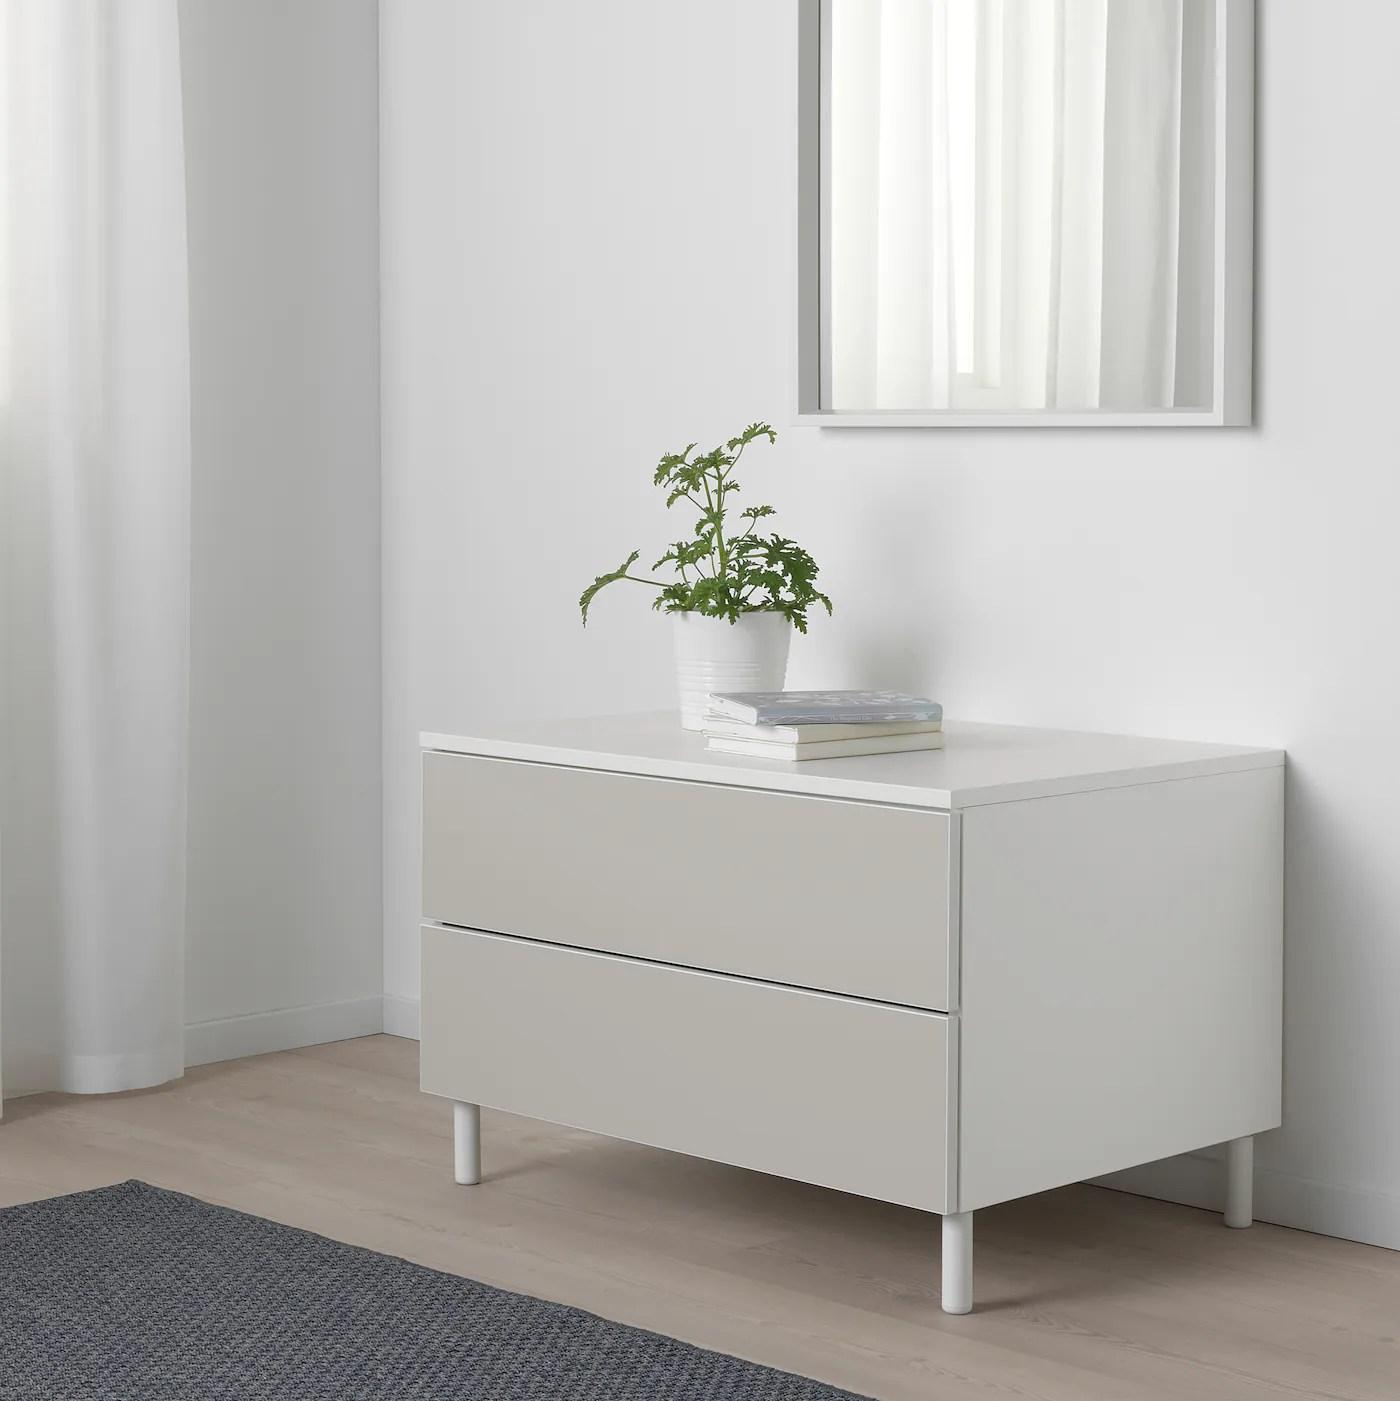 Platsa Kommode 2 Skuffer Hvid Skatval Lysegra Ikea